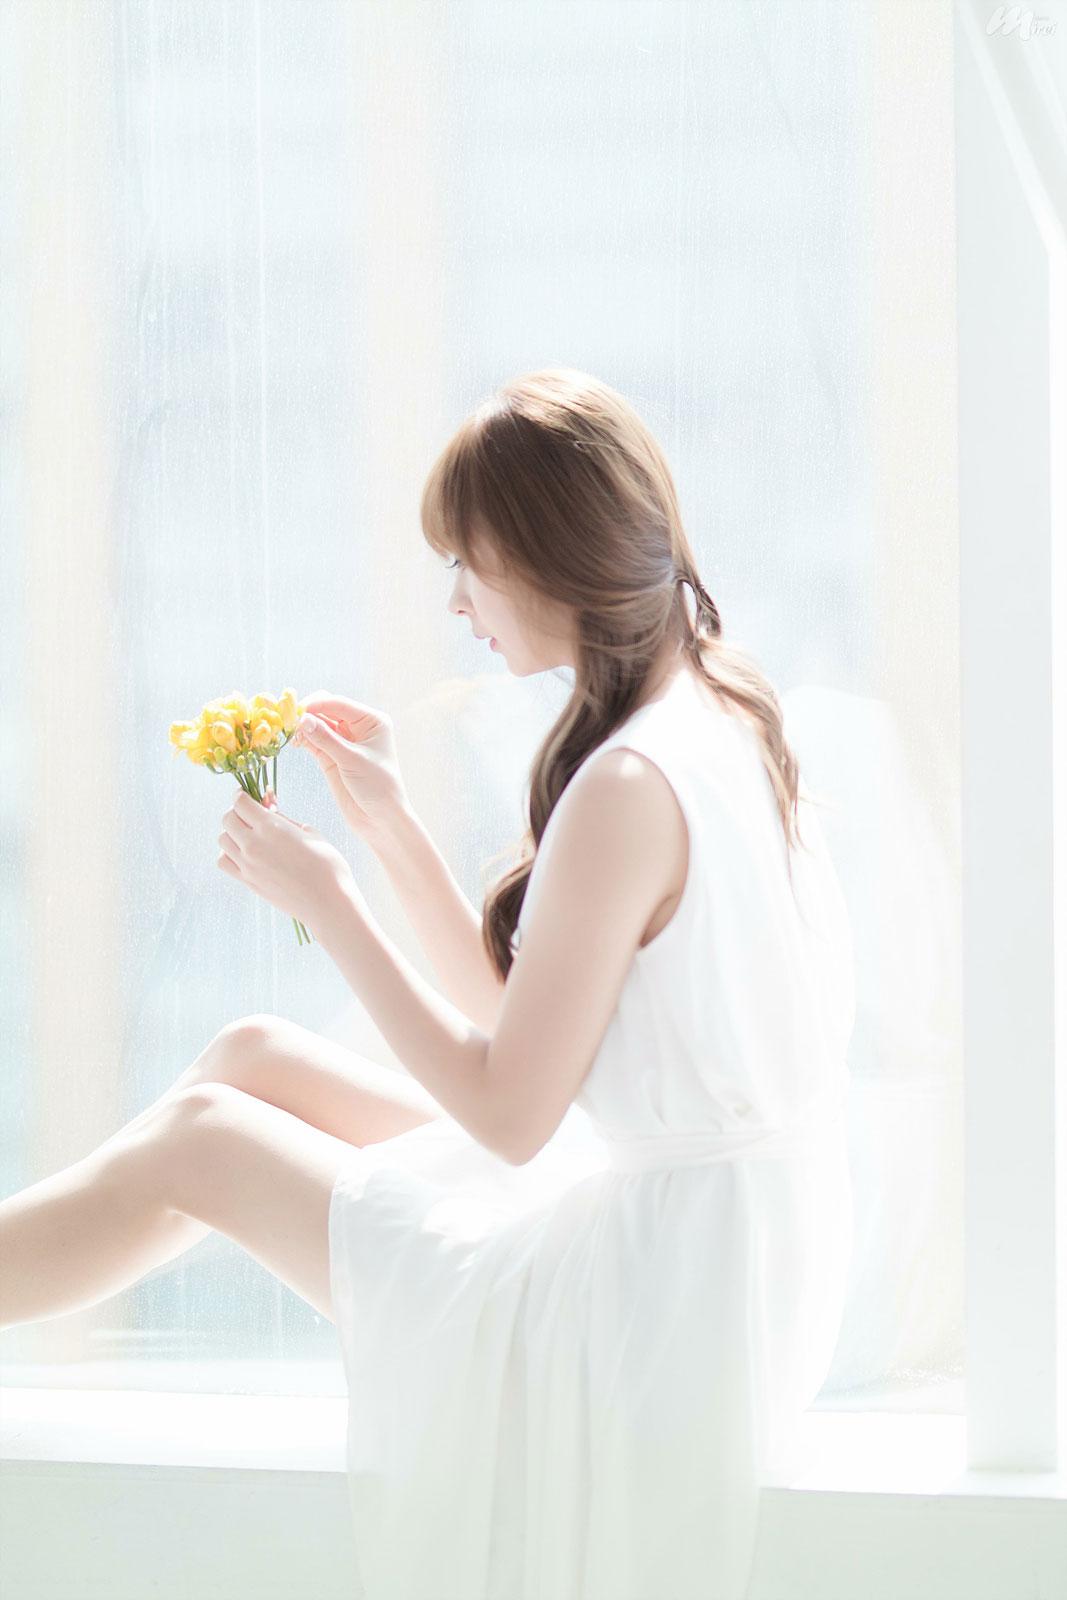 Seo Han Bit white dress studio photoshoot